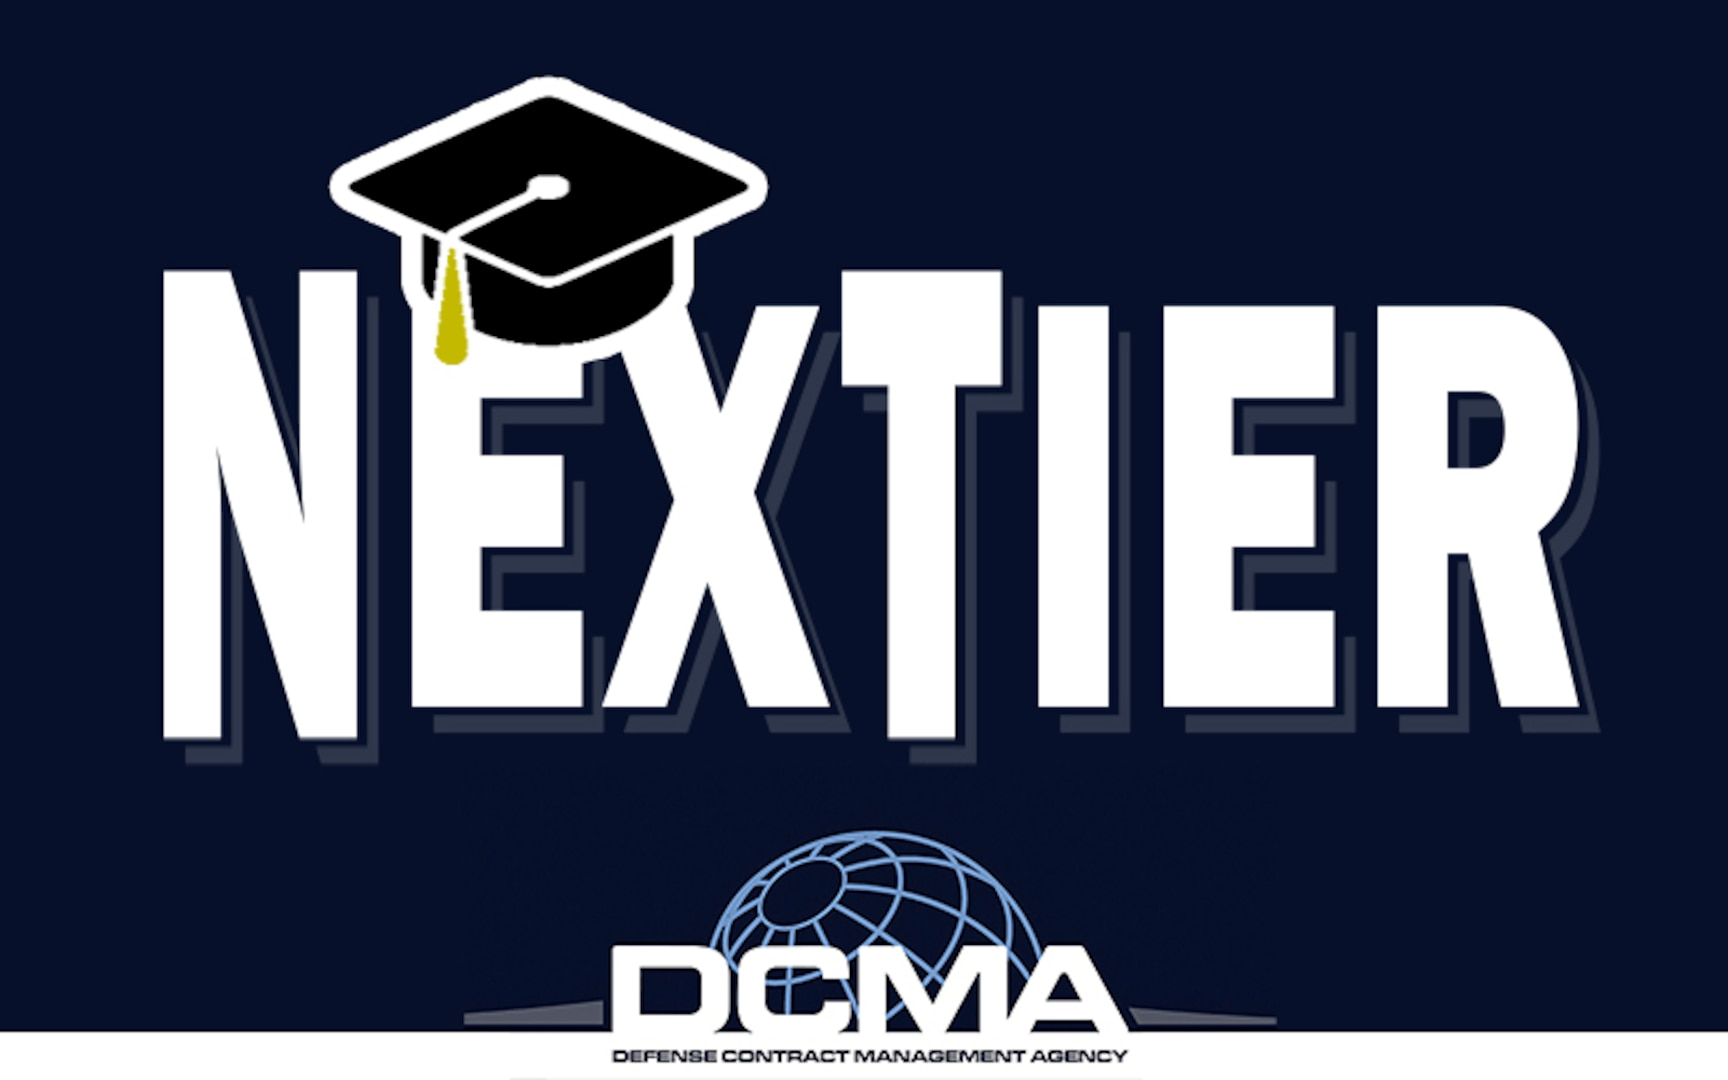 DCMA Atlanta NexTIER logo